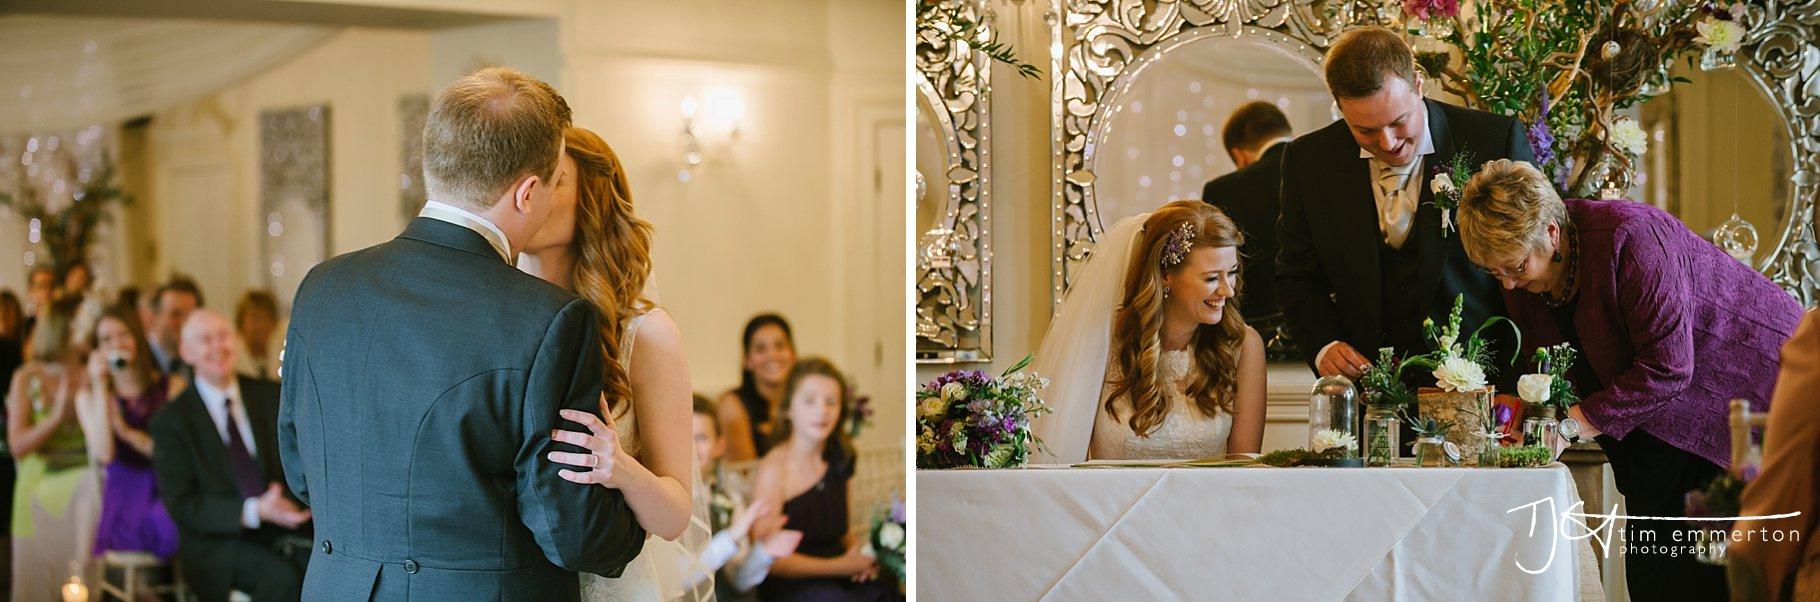 Eaves-Hall-Wedding-Photographer-050.jpg